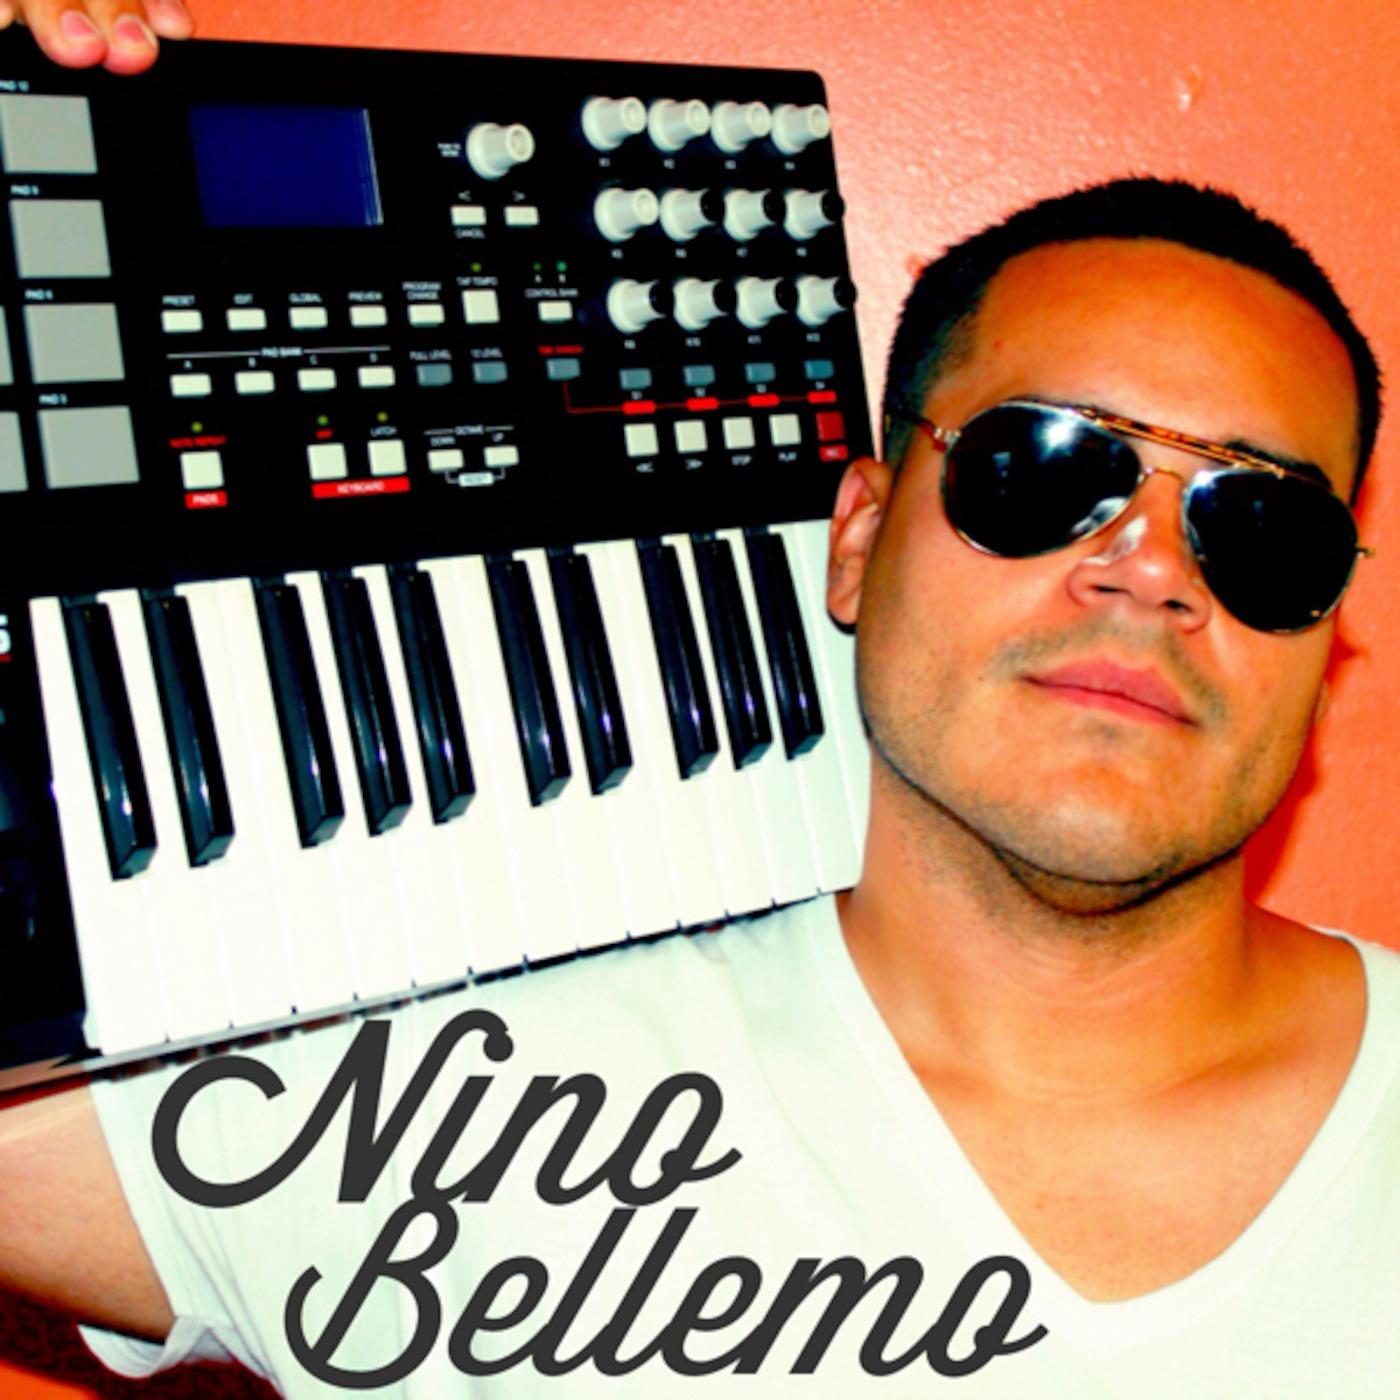 Nino Bellemo's Global Waiting 2015